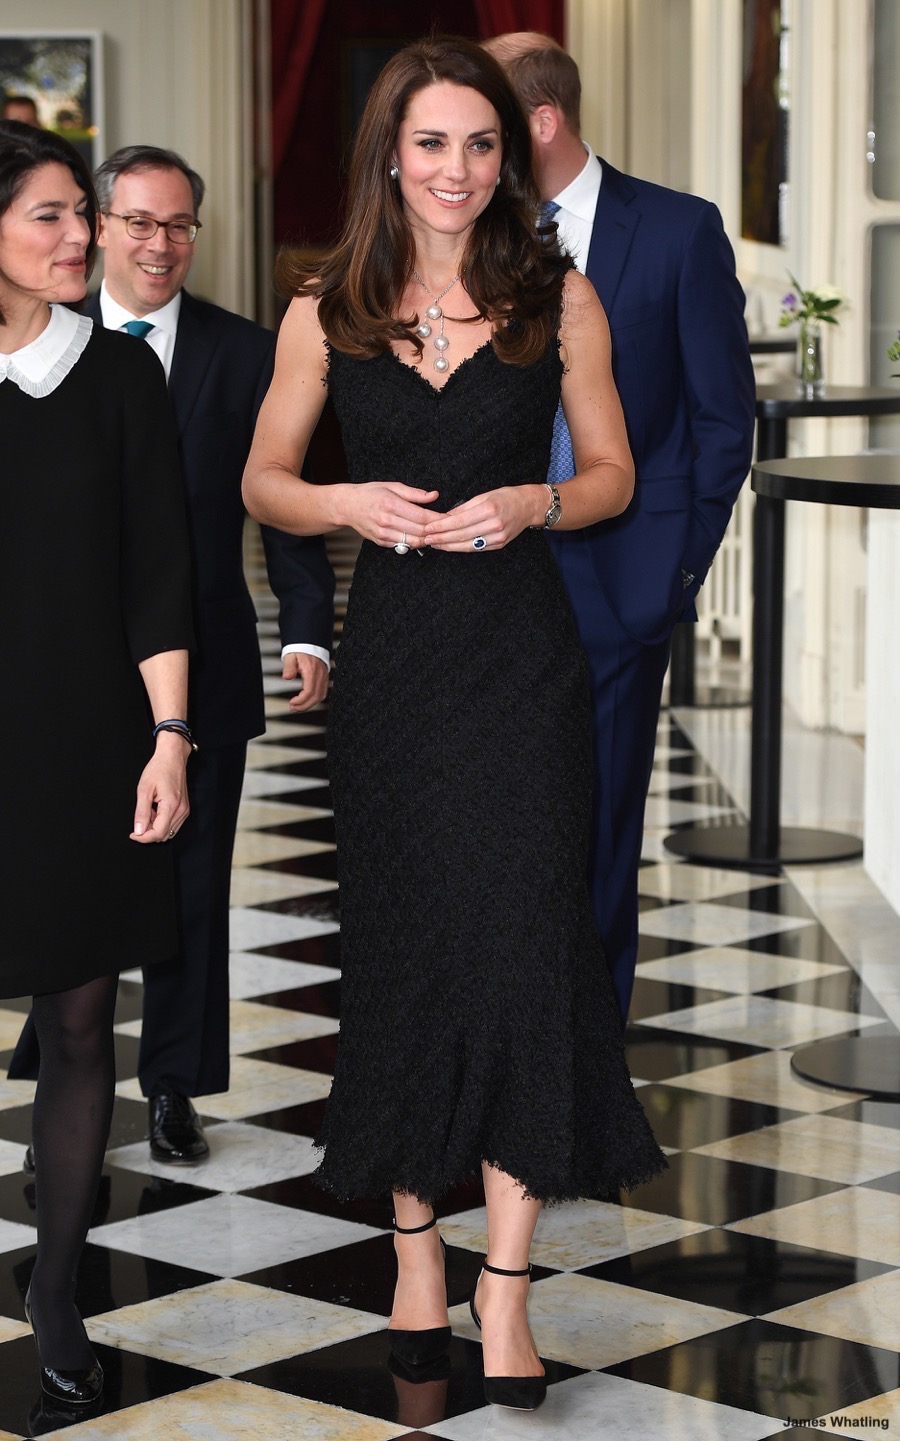 Kate Wears Black Alexander Mcqueen Dress To British